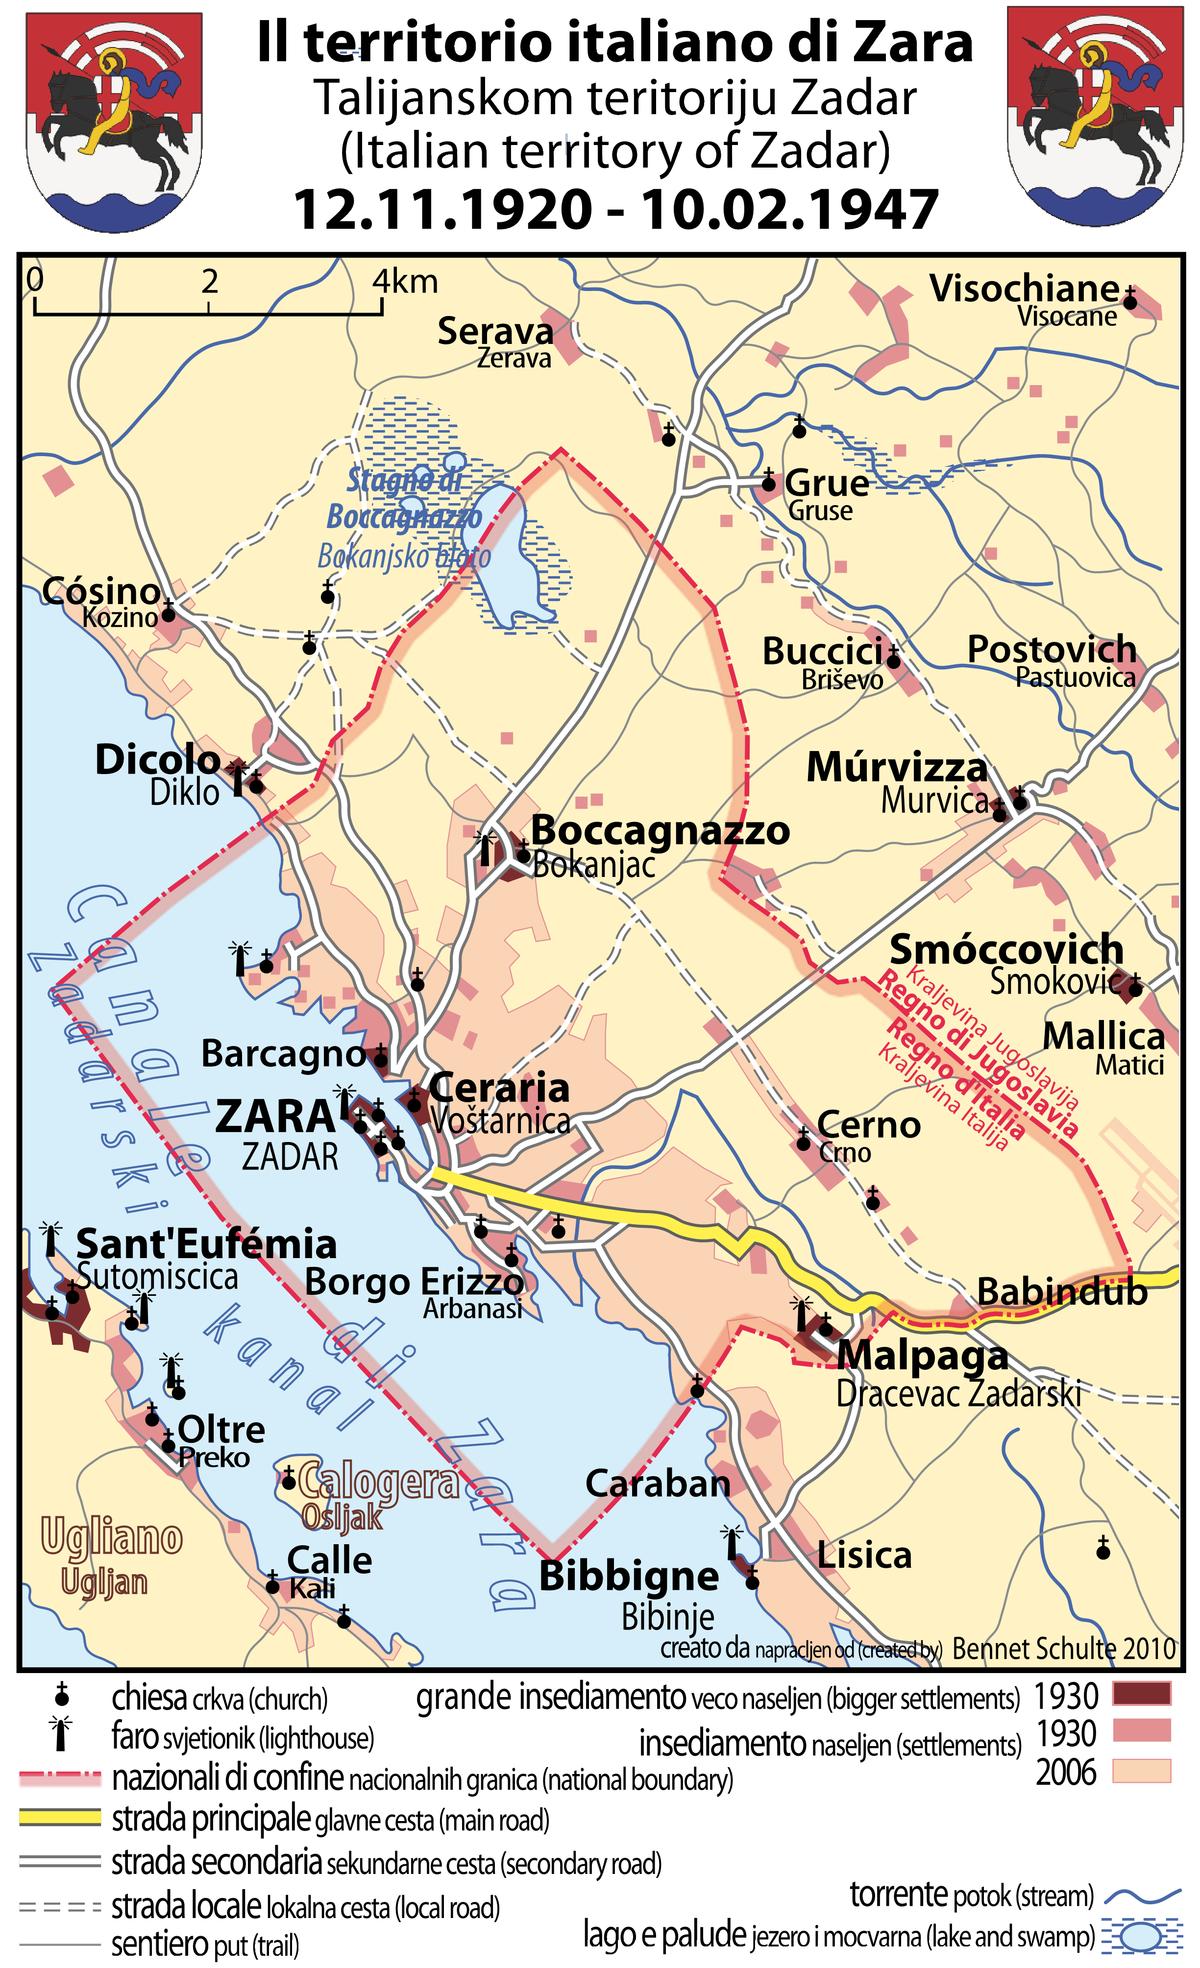 Dalmazia Italiana Cartina.File Zara Zadar 1920 1947 Png Wikimedia Commons